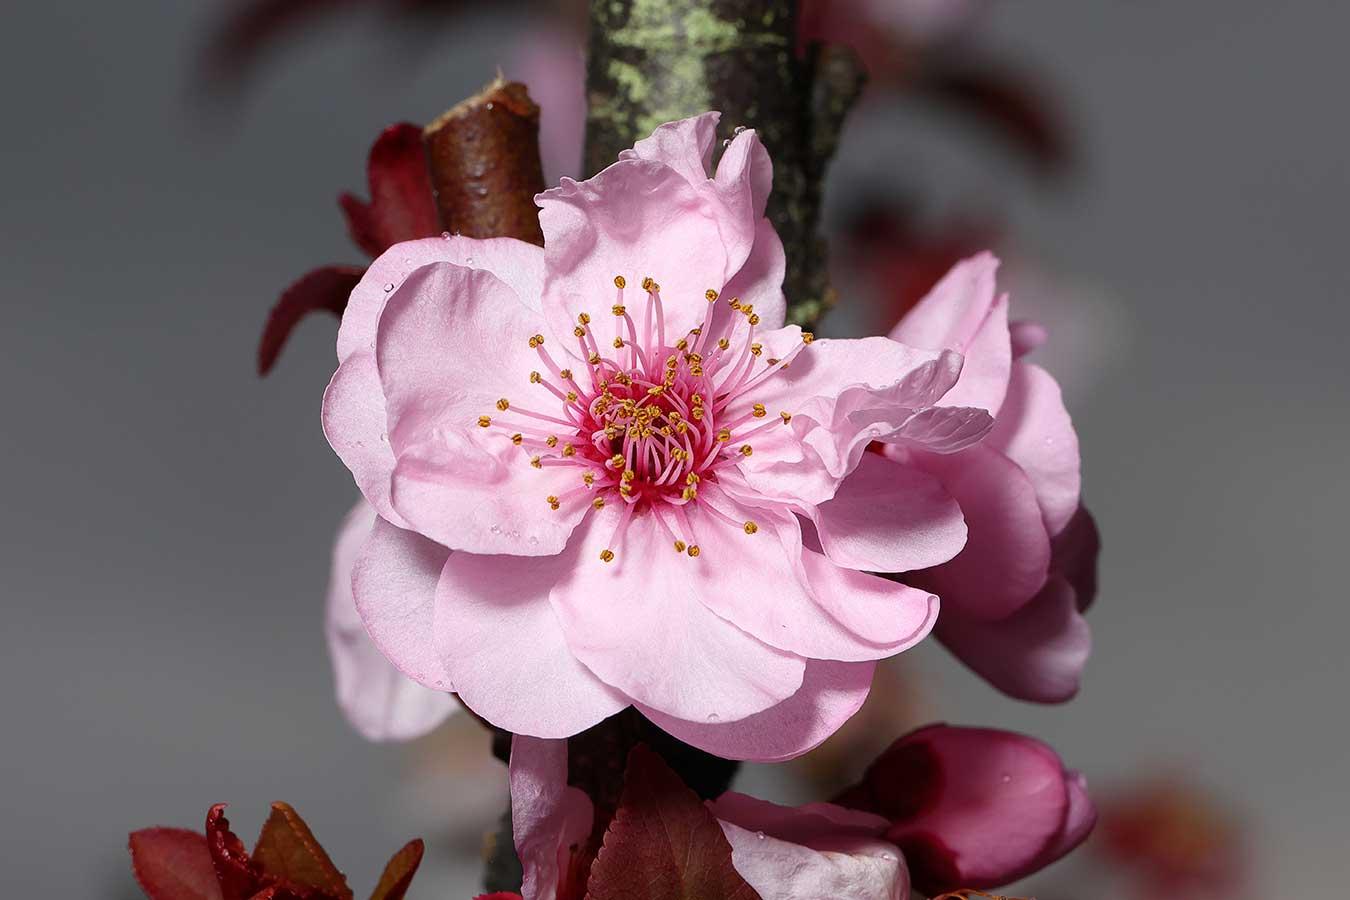 cherry-blossom-macro-shot-by-phil-reid